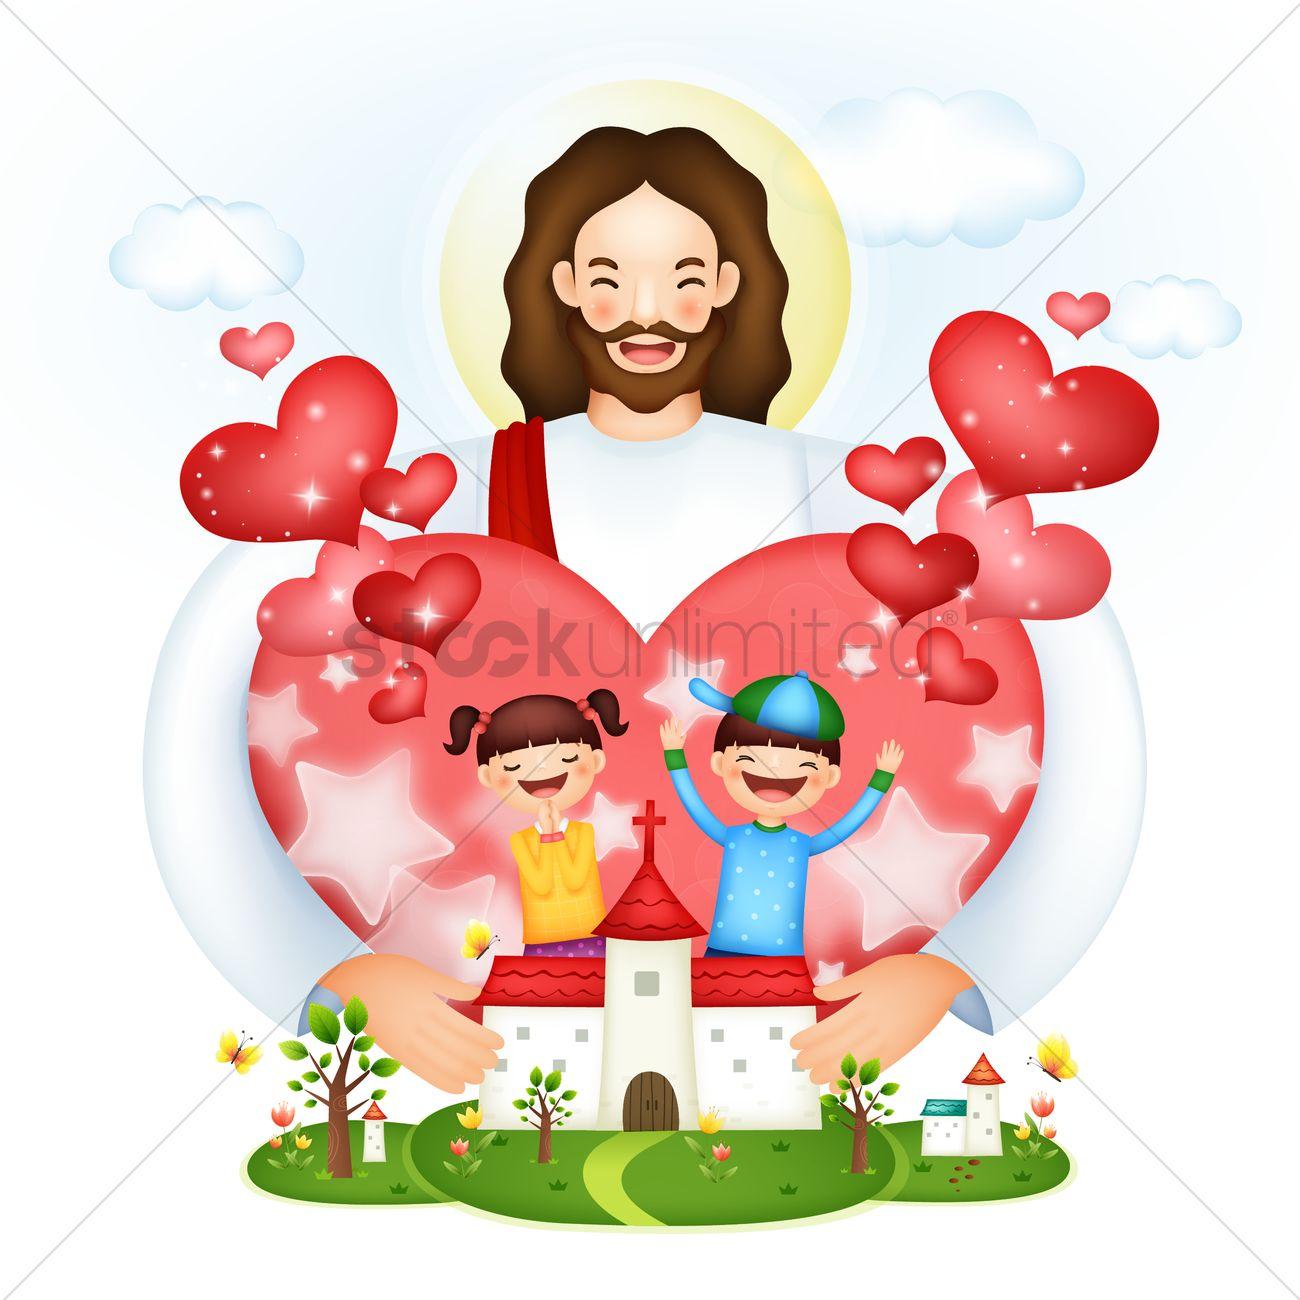 Jesus love Vector Image - 1492695   StockUnlimited